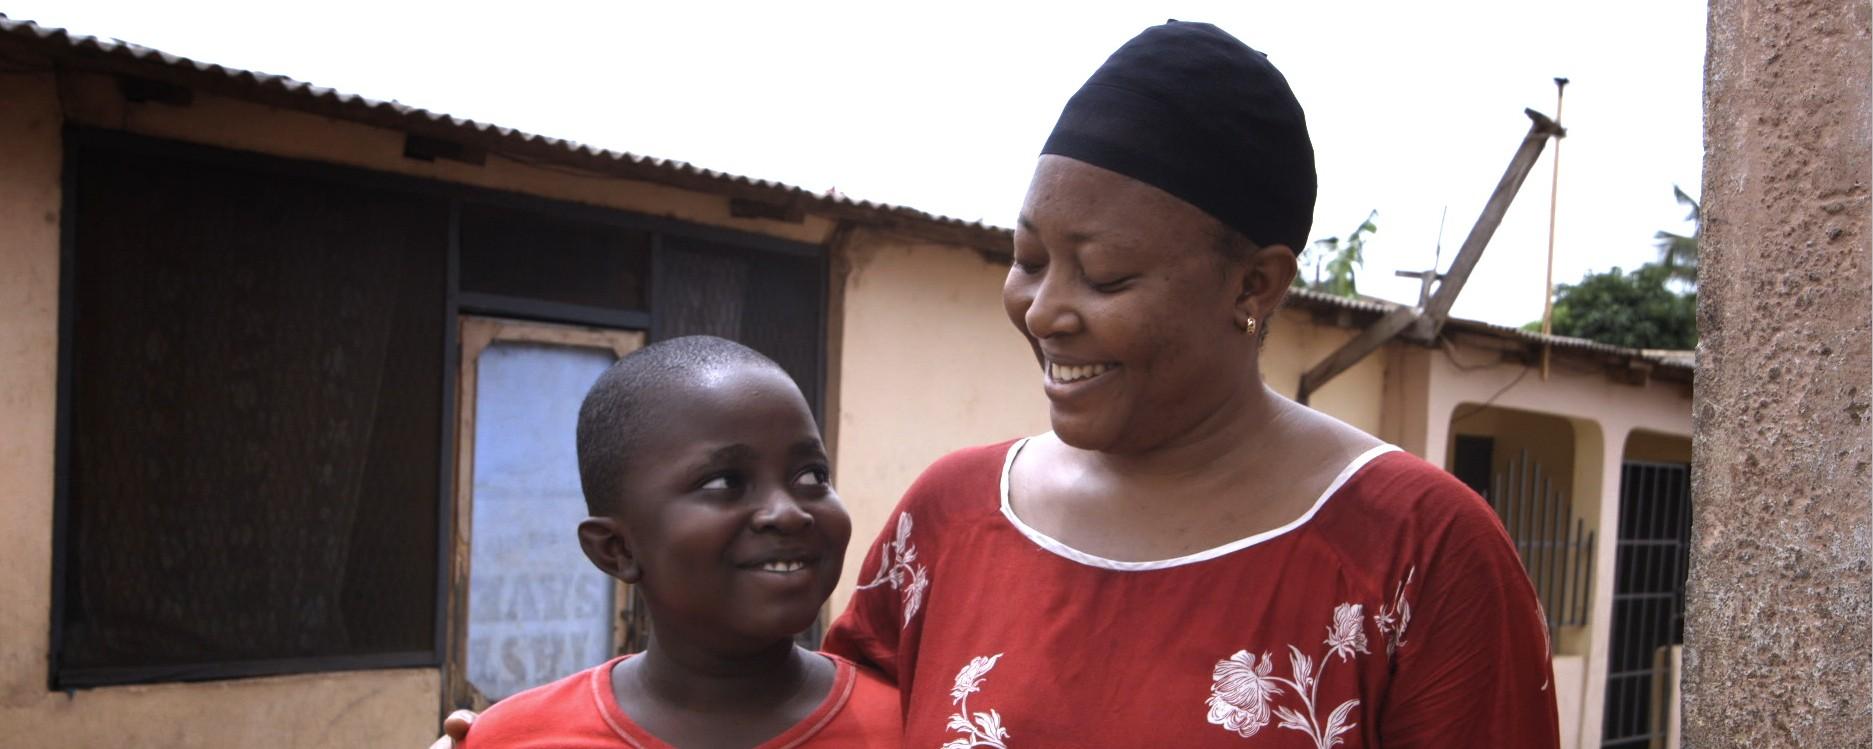 Victoria Amponsah's story